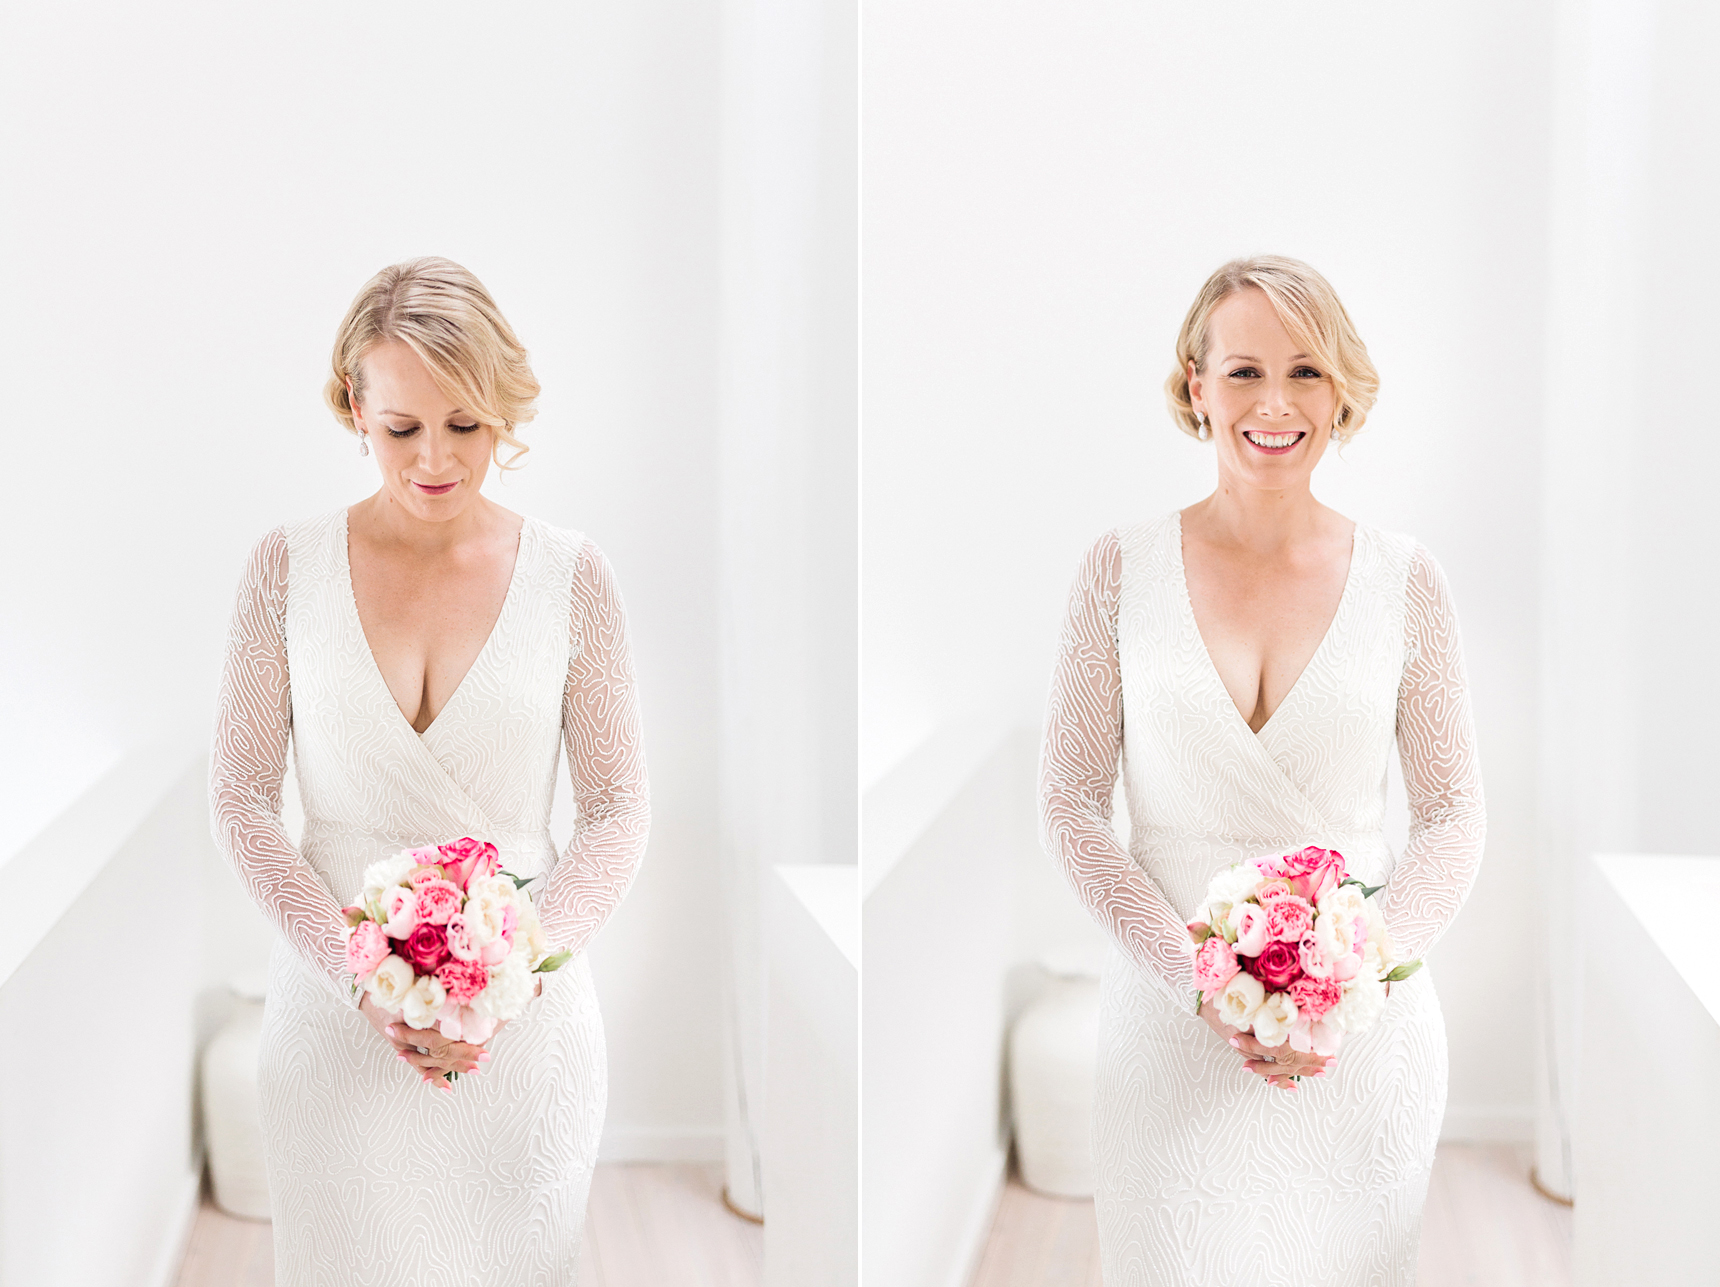 AngeRuss_MobyDicks_WhaleBeach_Wedding_Photography020.jpg